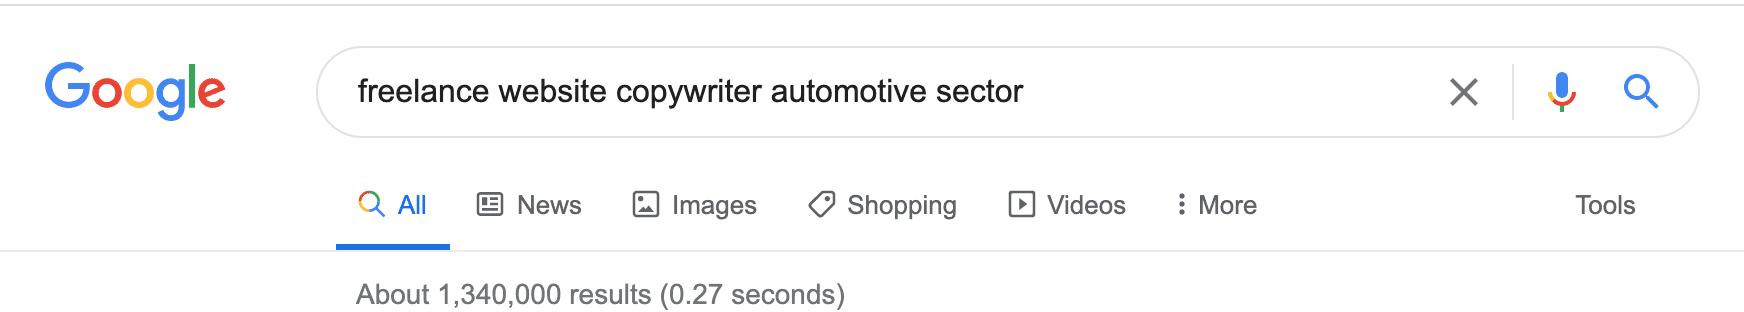 Google automotive copywriter